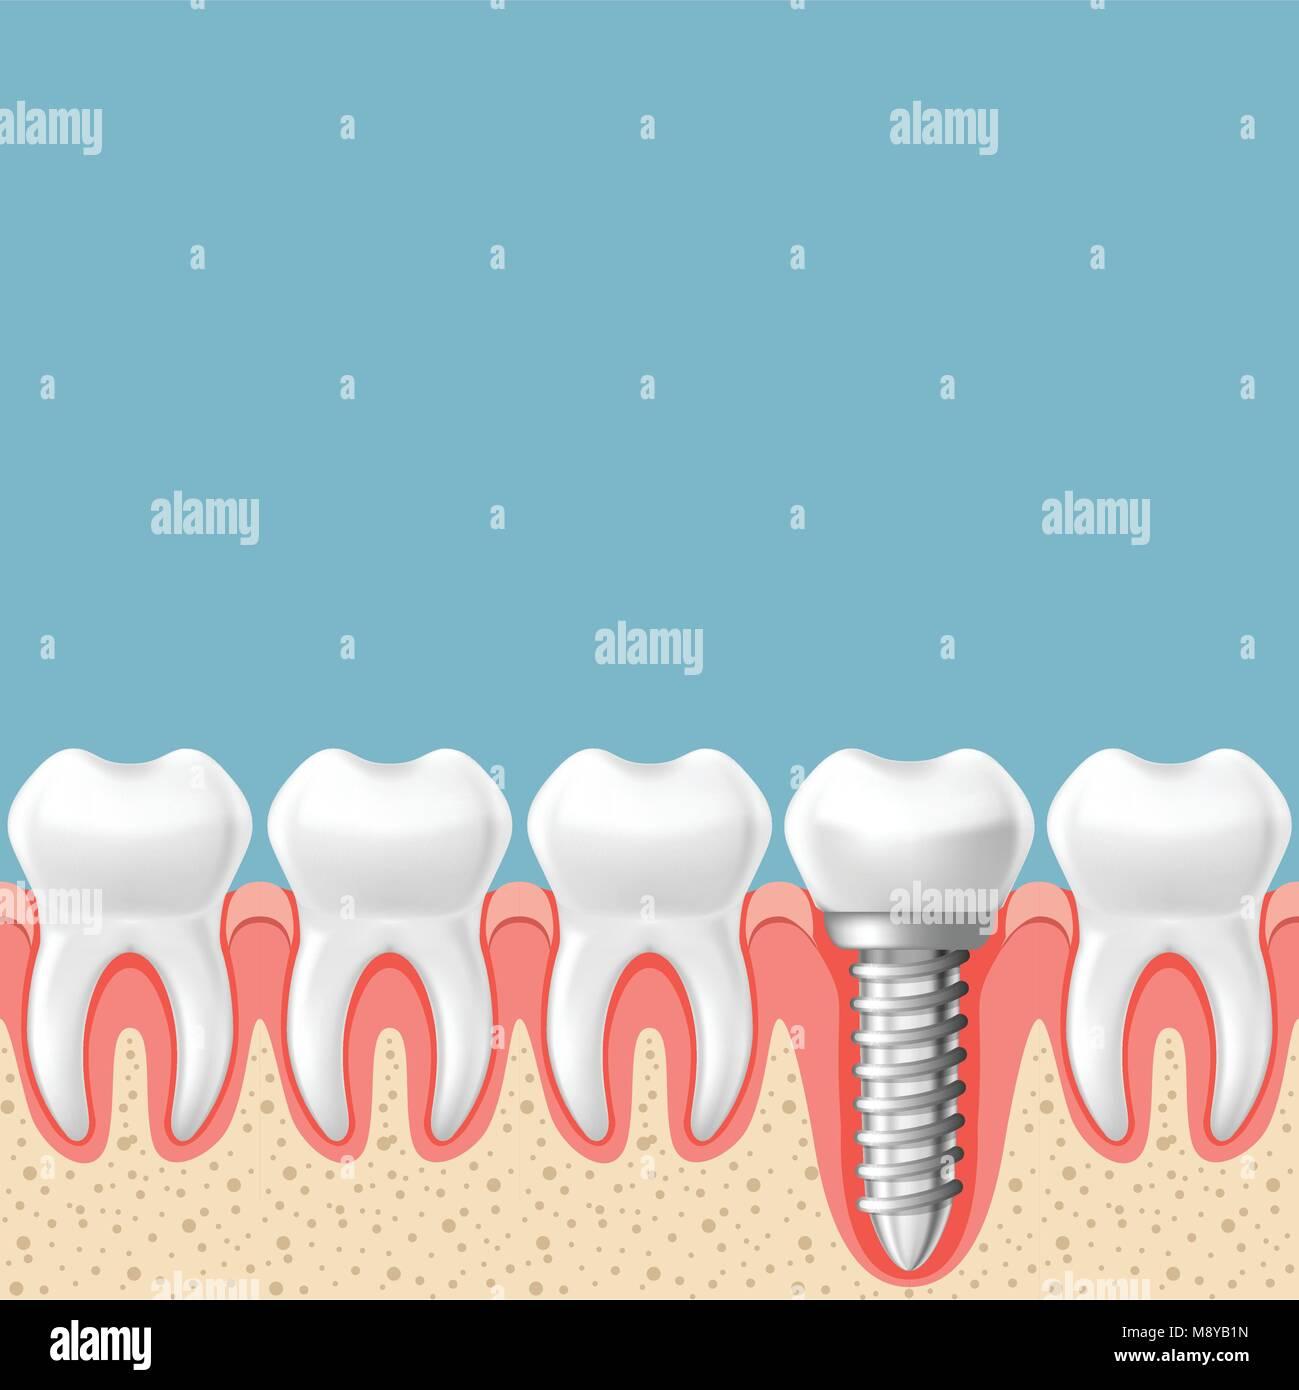 Row of teeth with dental implant - teeth prosthetics scheme, gum cut - Stock Image